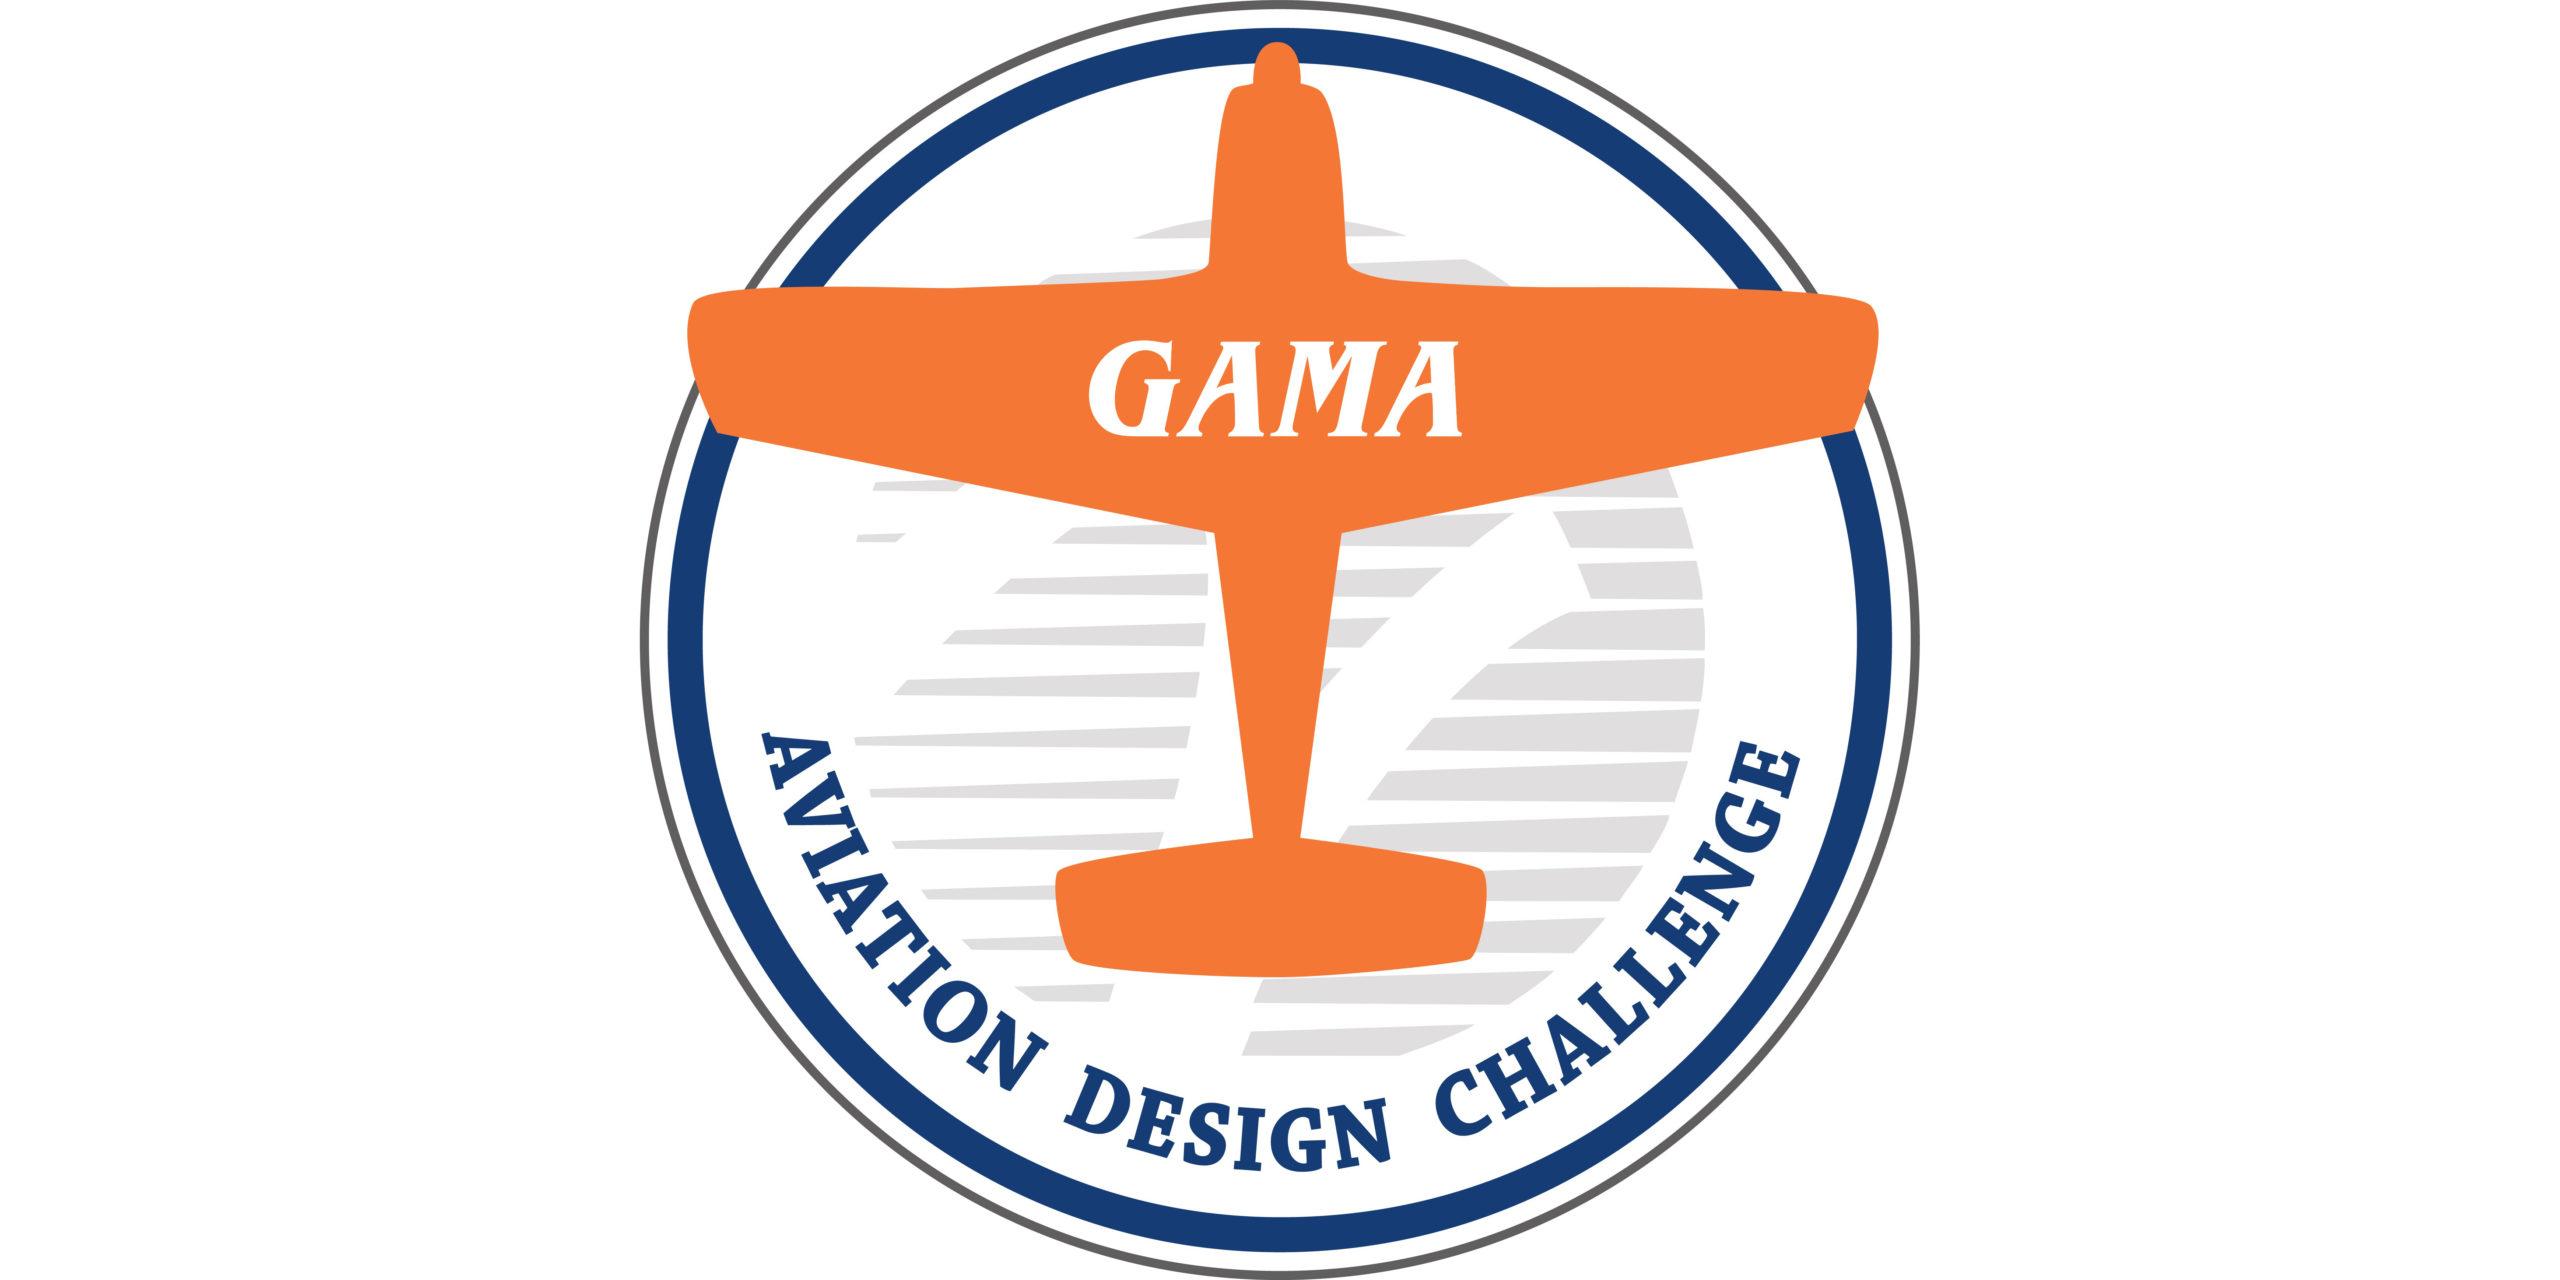 GAMA Announces 2020 Design Challenge Winners